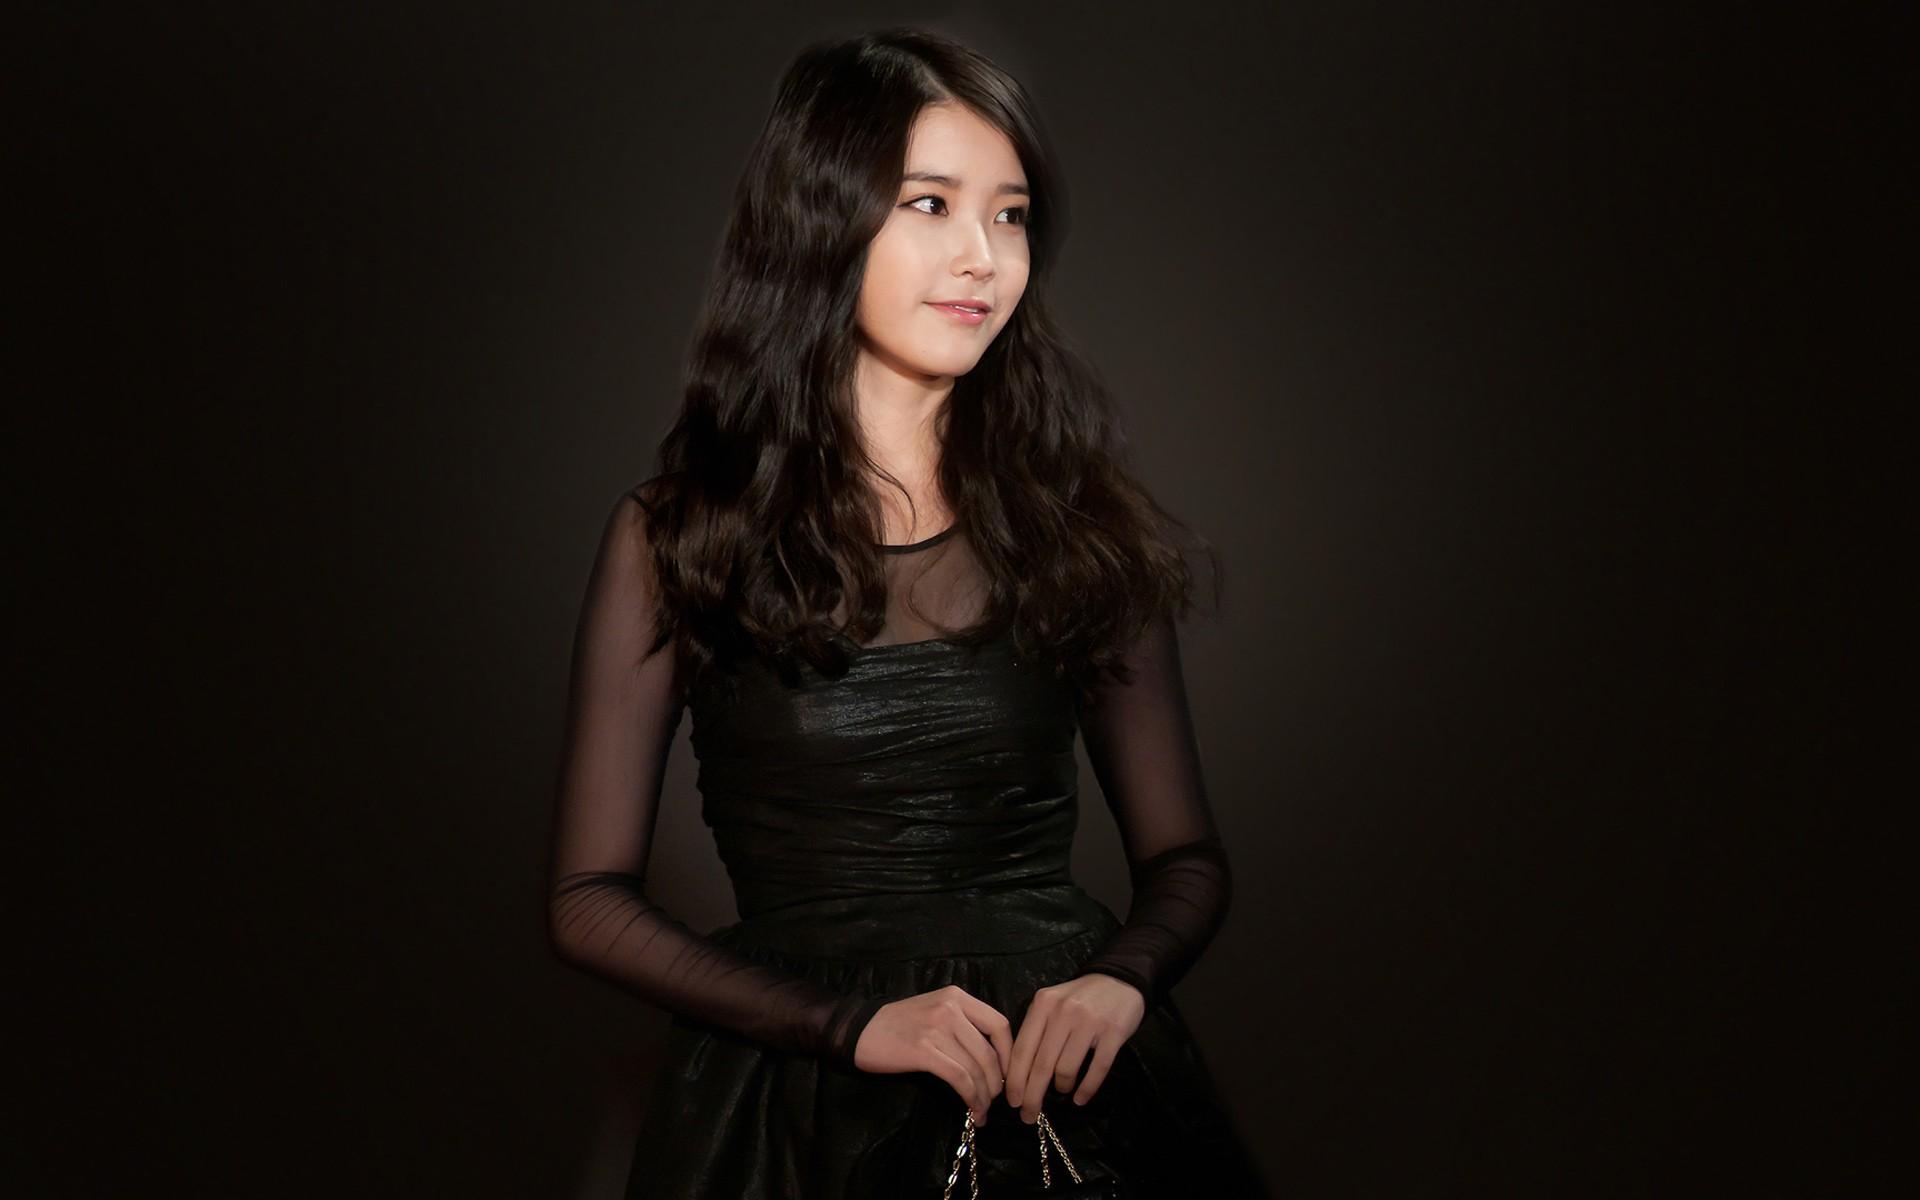 Free Download Lovely Cute Black Dress Asian Girl Wallpaper